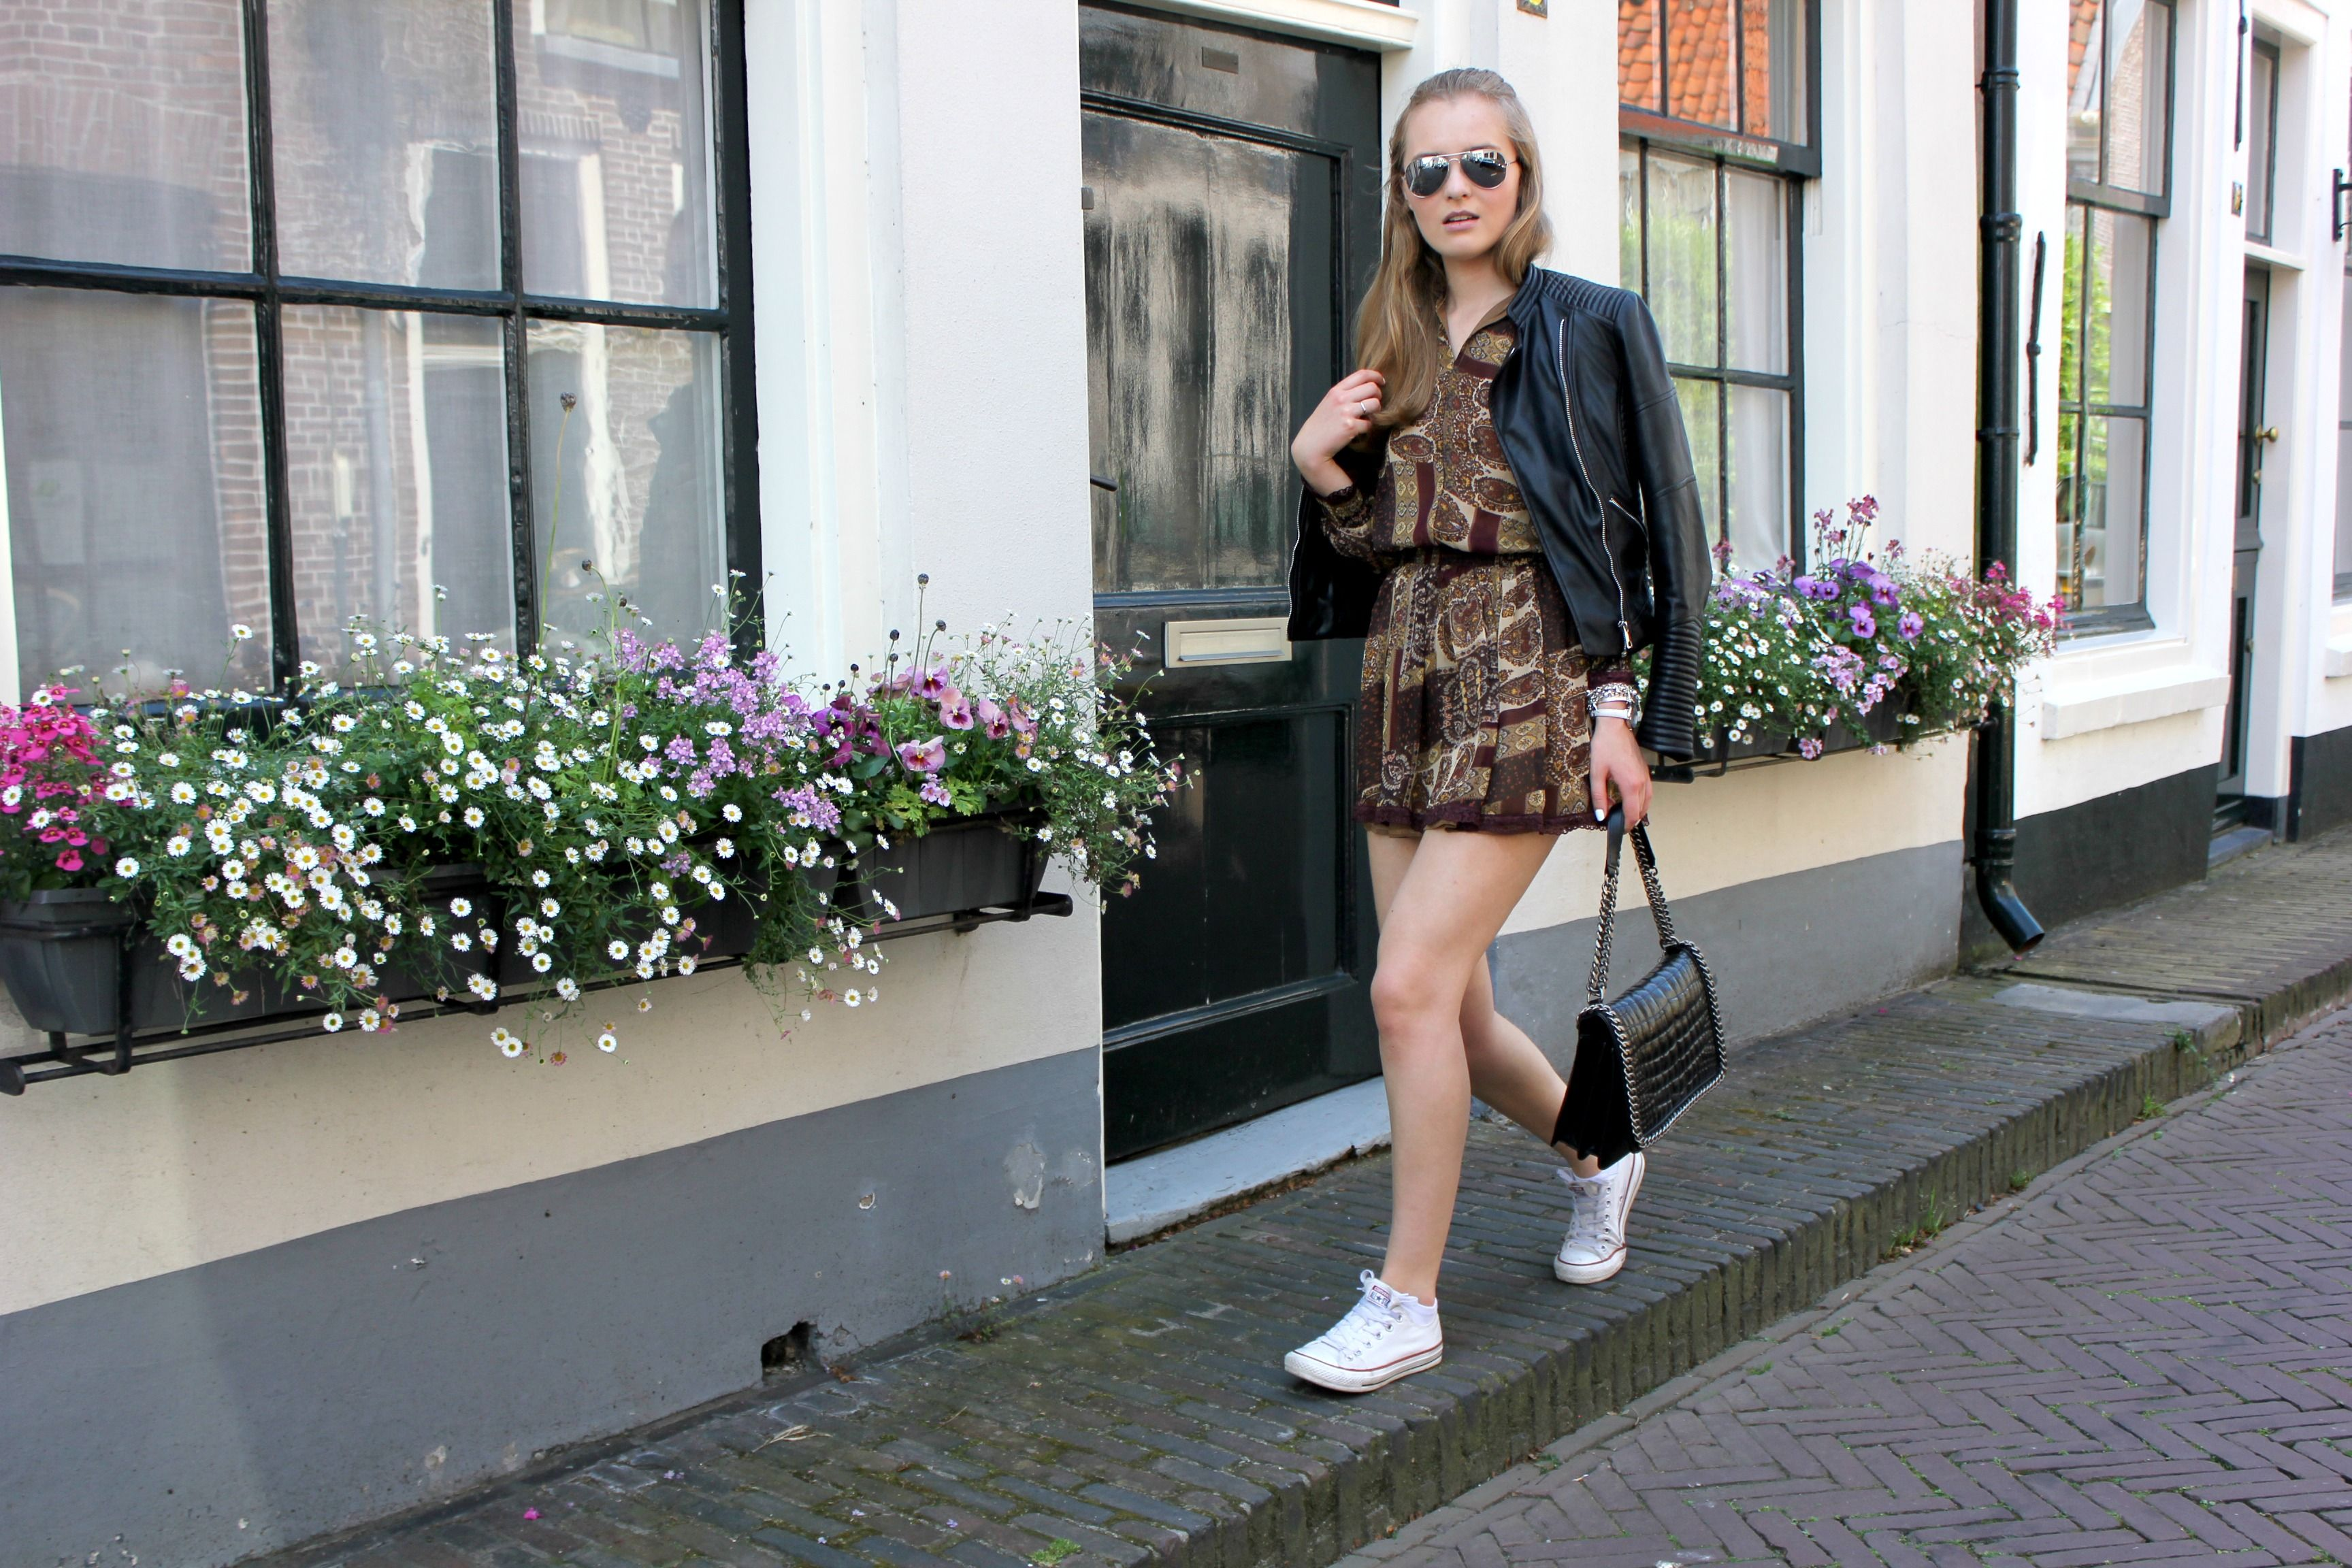 MISS. CONFIDENTIAL X MODE I #missconfidential #fashionblogger #blog #blogger #fashion #amsterdam #ootd #look http://www.miss-confidential.com/miss-confidential-x-mode/